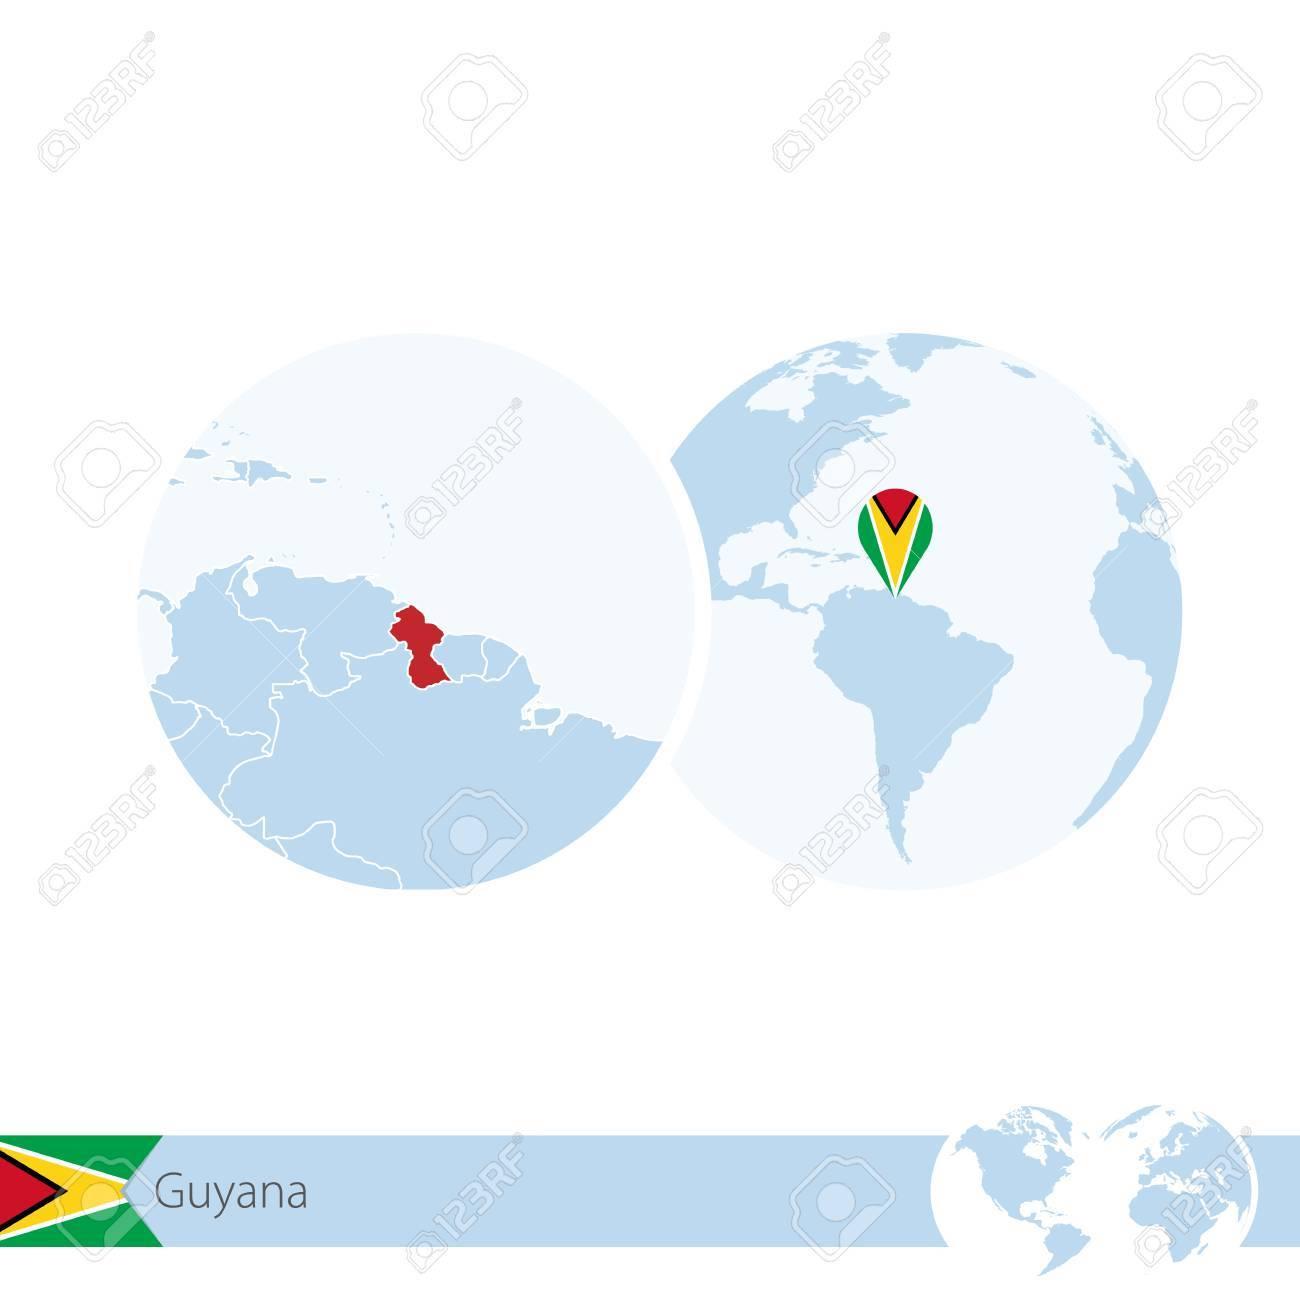 Guyana On World Globe With Flag And Regional Map Of Guyana Vector